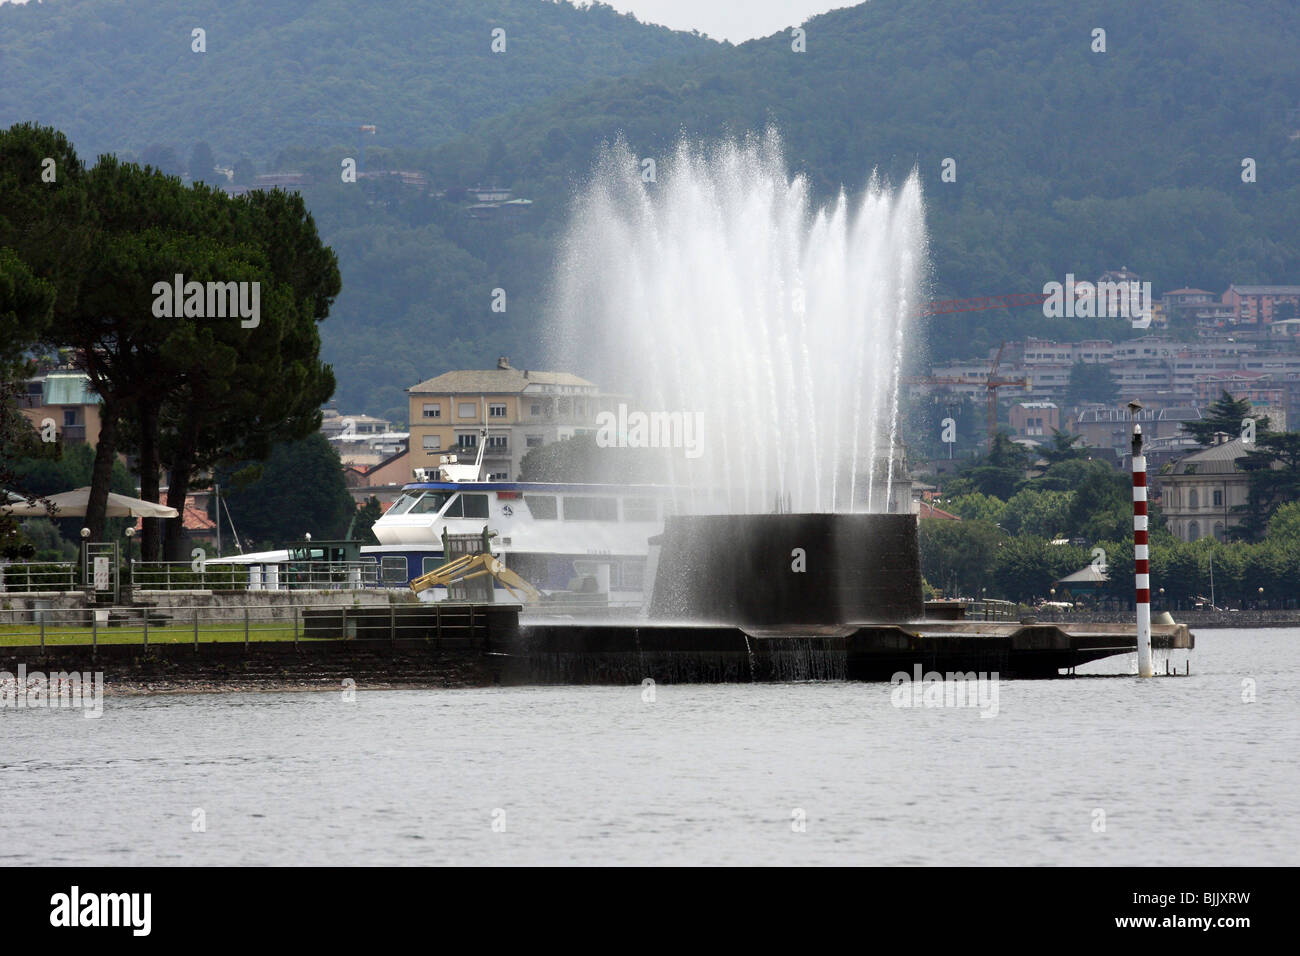 Italy, Lombardy, Lake Como fountain - Stock Image